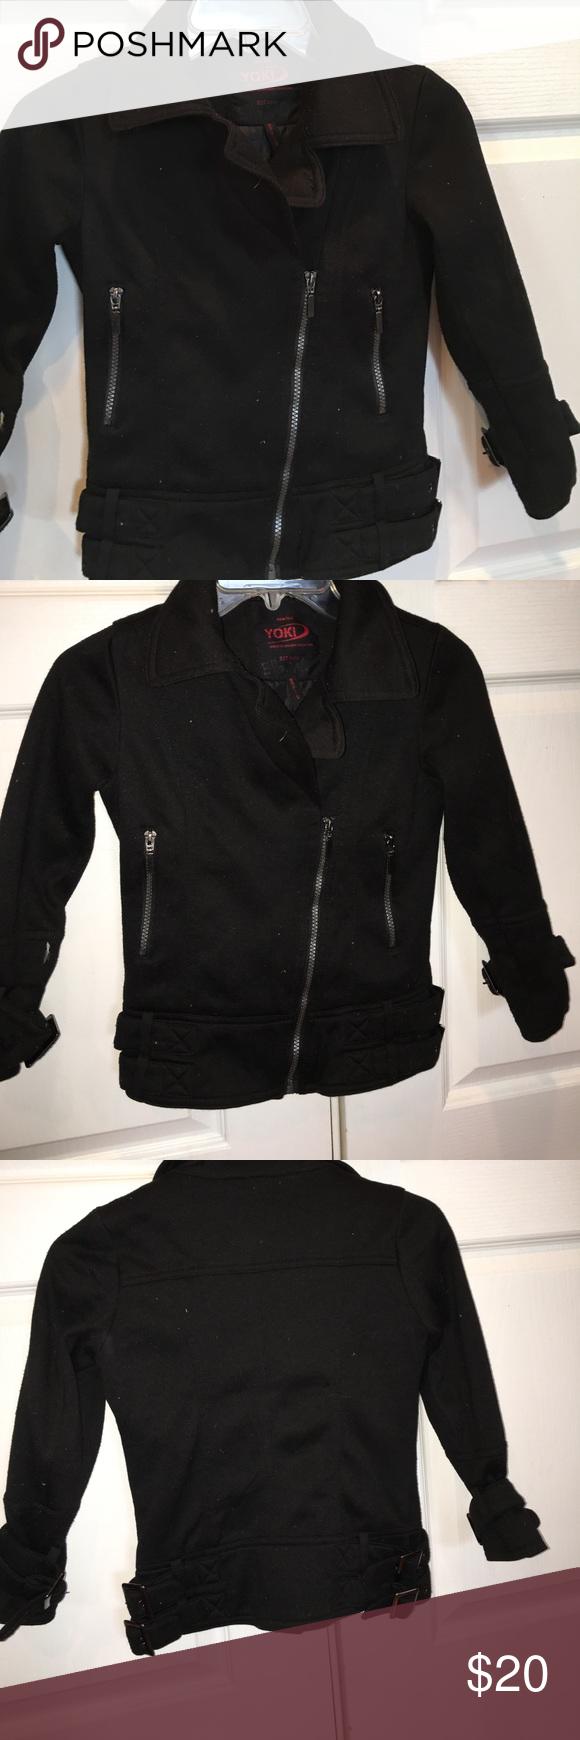 Jacket Fun Stylish Black Jacket Name Written On Tag Guc Yoki Jackets Coats Jackets Fashion Fashion Design [ 1740 x 580 Pixel ]